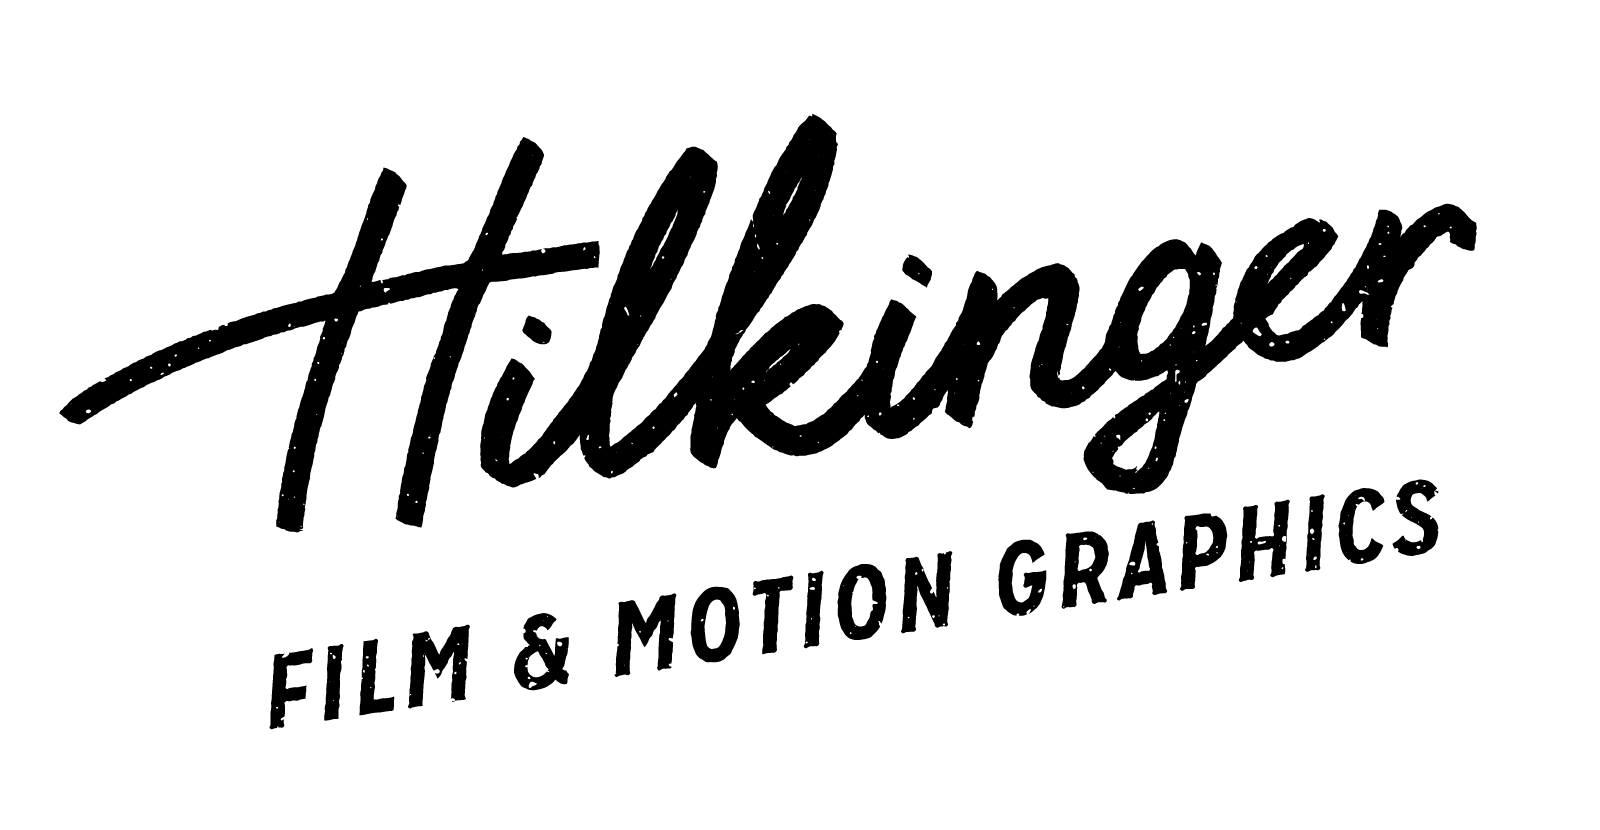 hilkinger_logotype_schräg_textur_2015-07-28.png